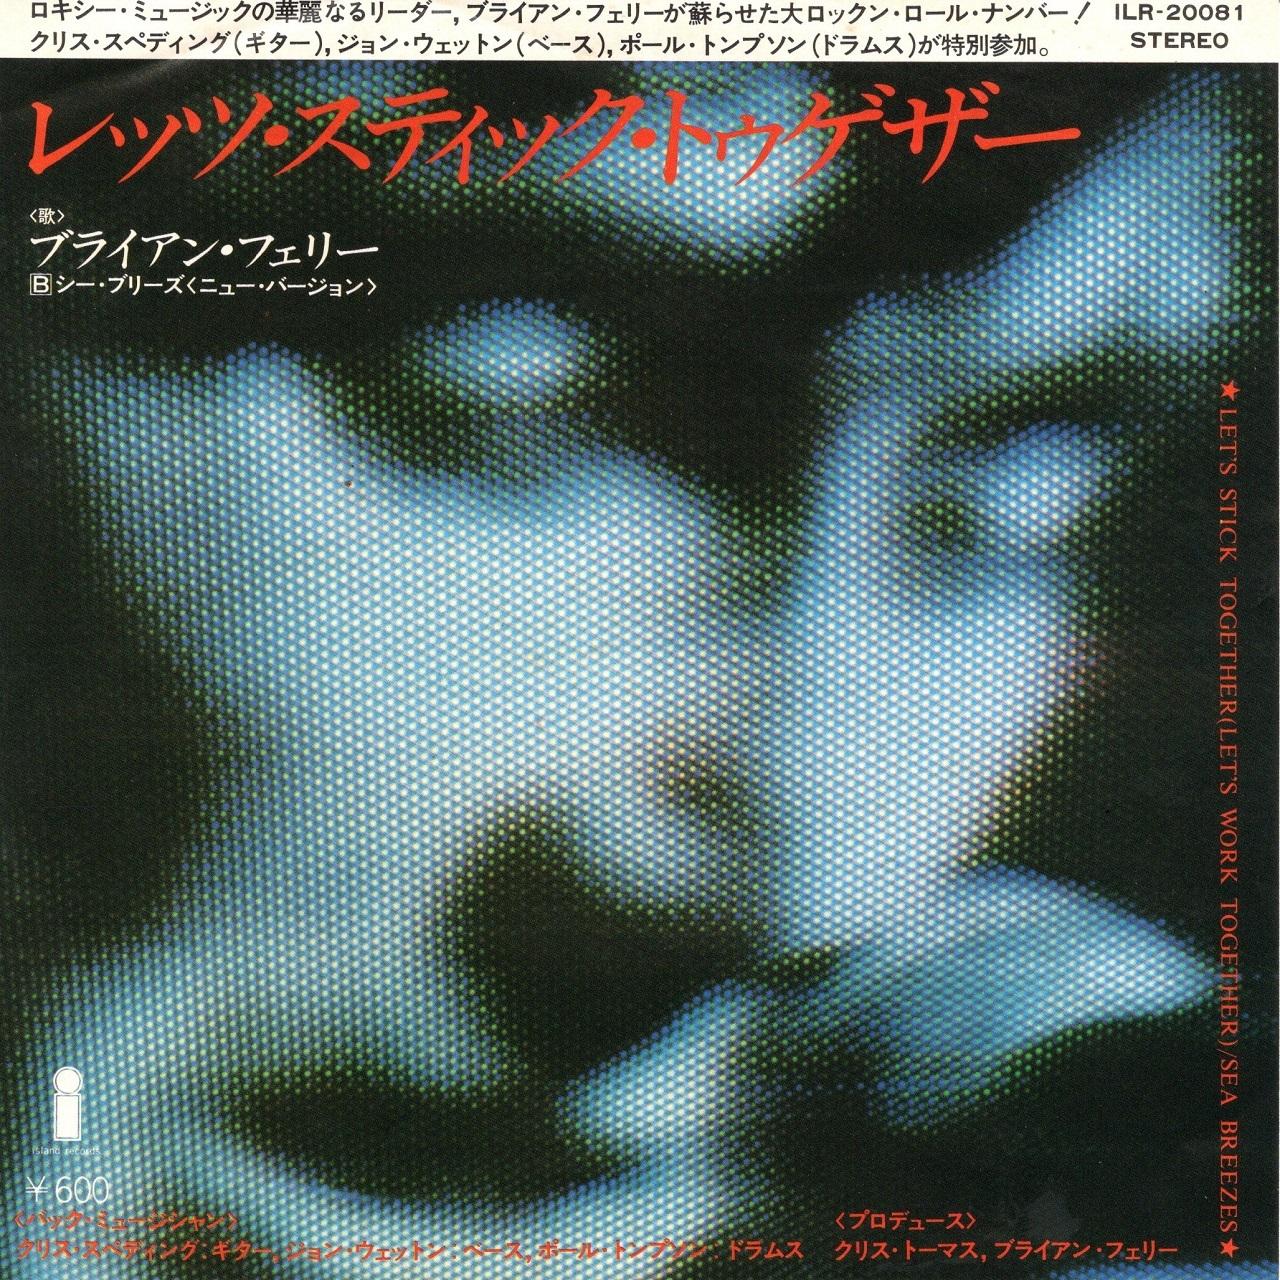 【7inch・国内盤】ブライアン・フェリー / レッツ・スティック・トゥゲザー